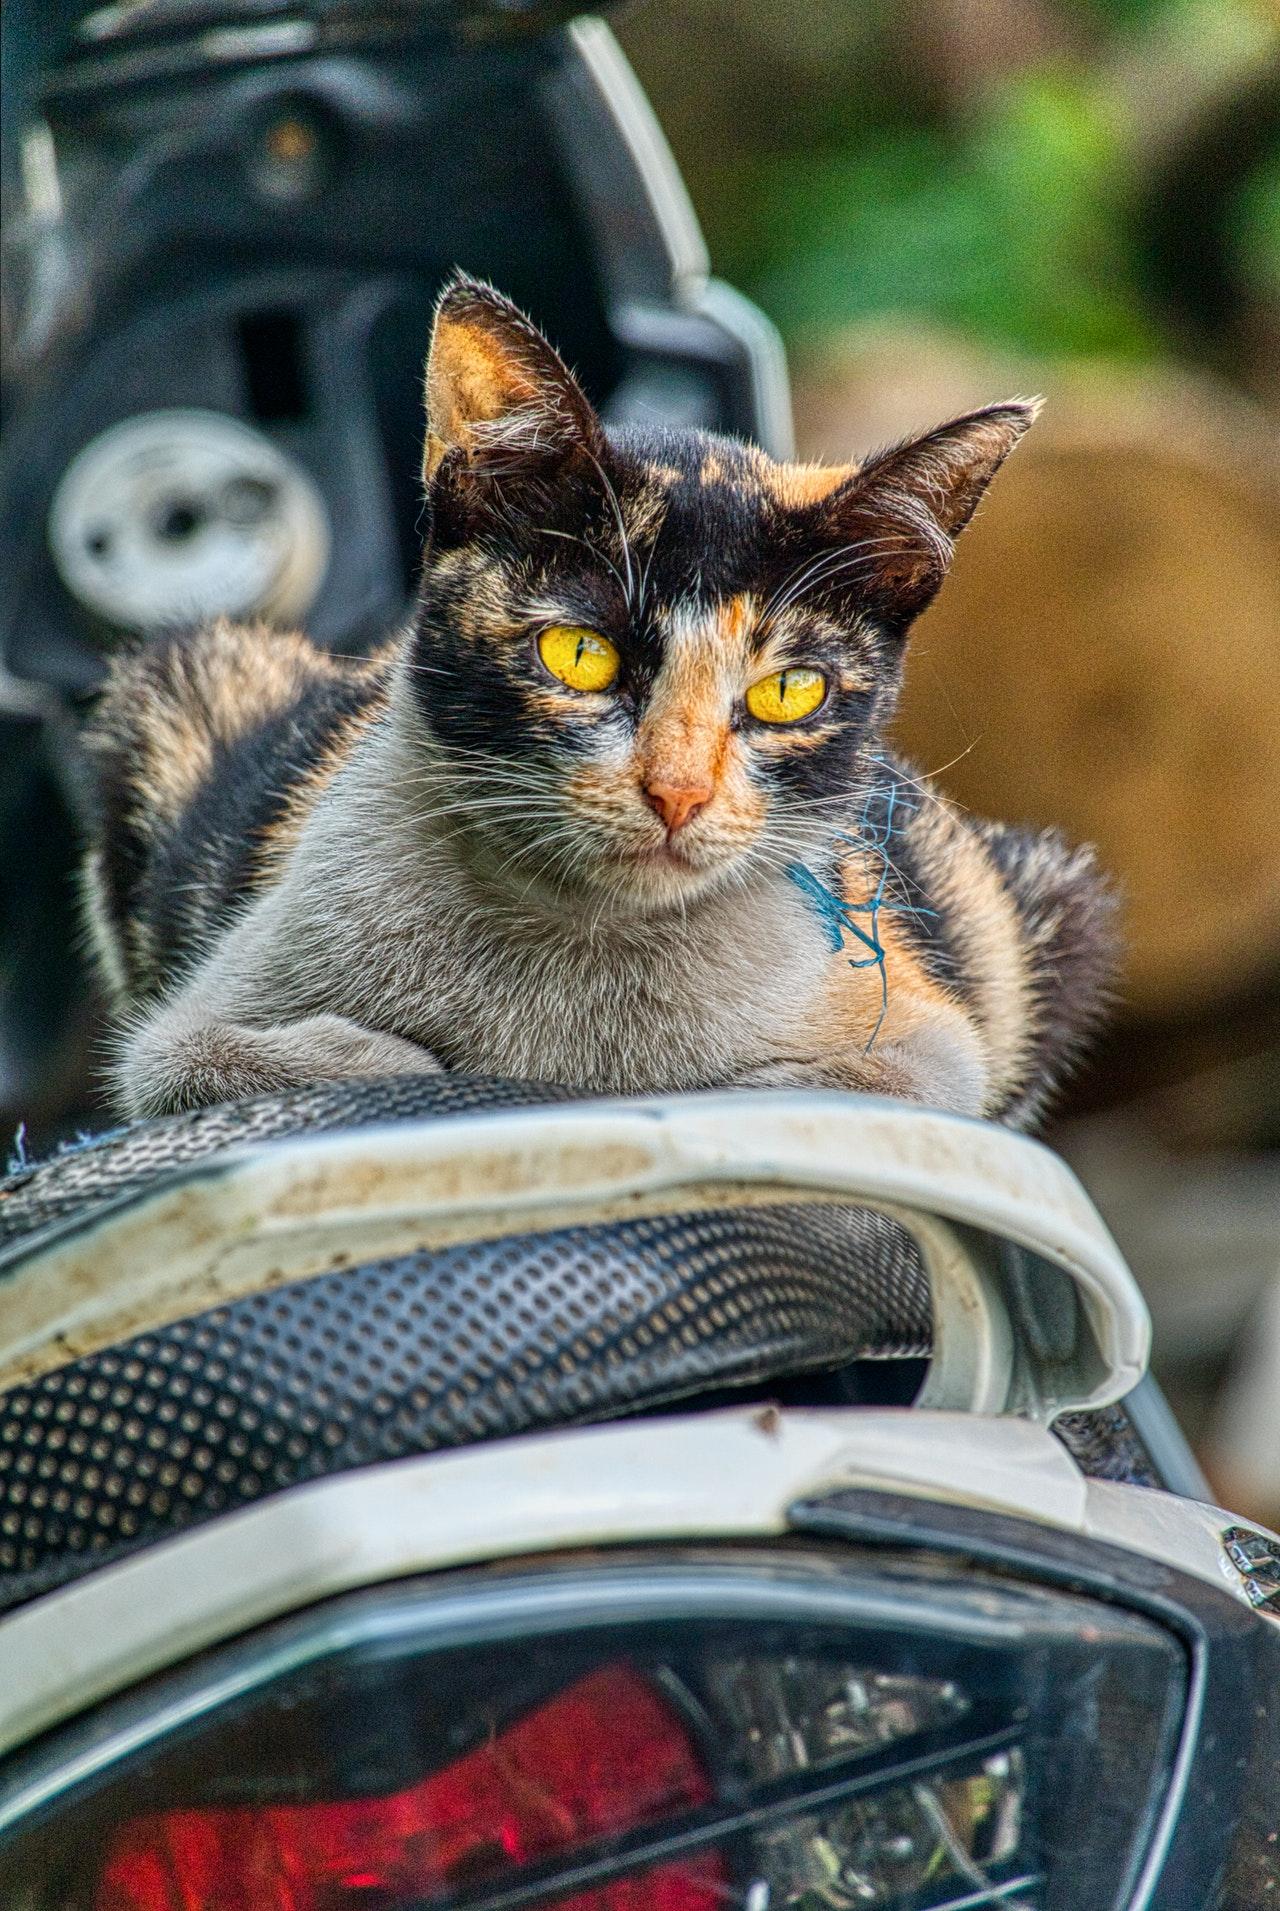 adorable-animal-cat-2589324.jpg